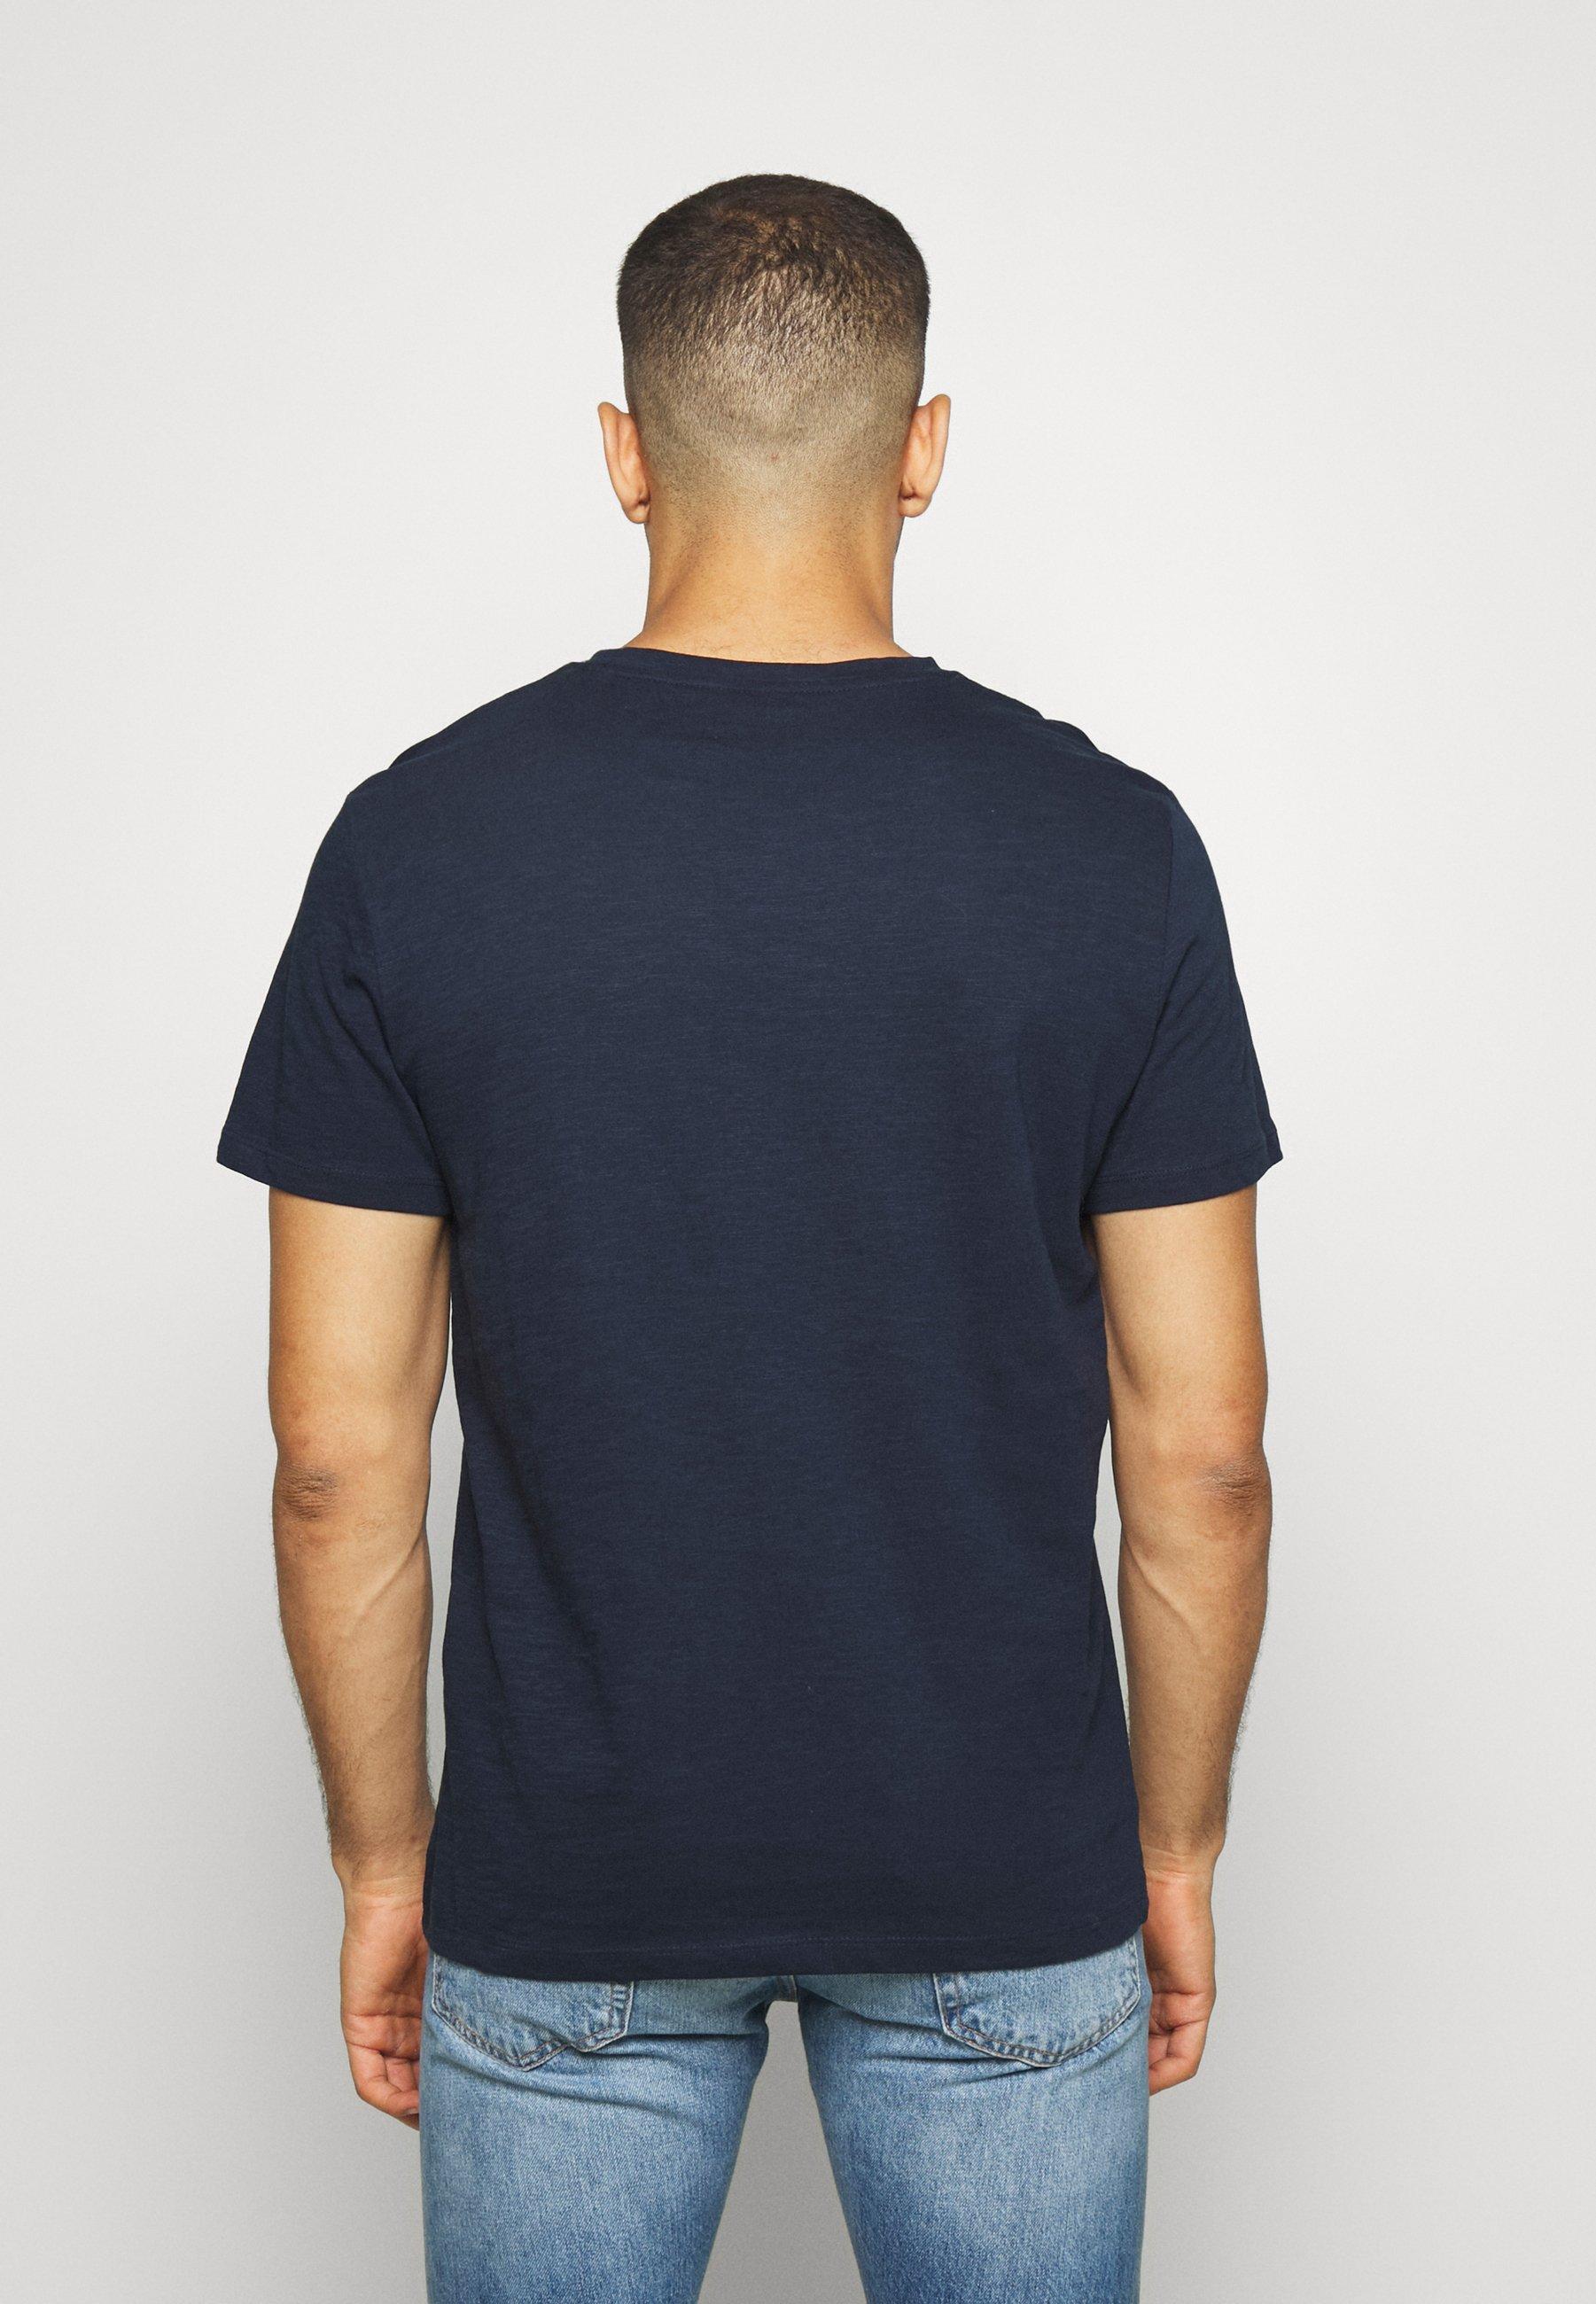 TOM TAILOR WITH POCKET - Basic T-shirt - sky captain blue fMTlQ